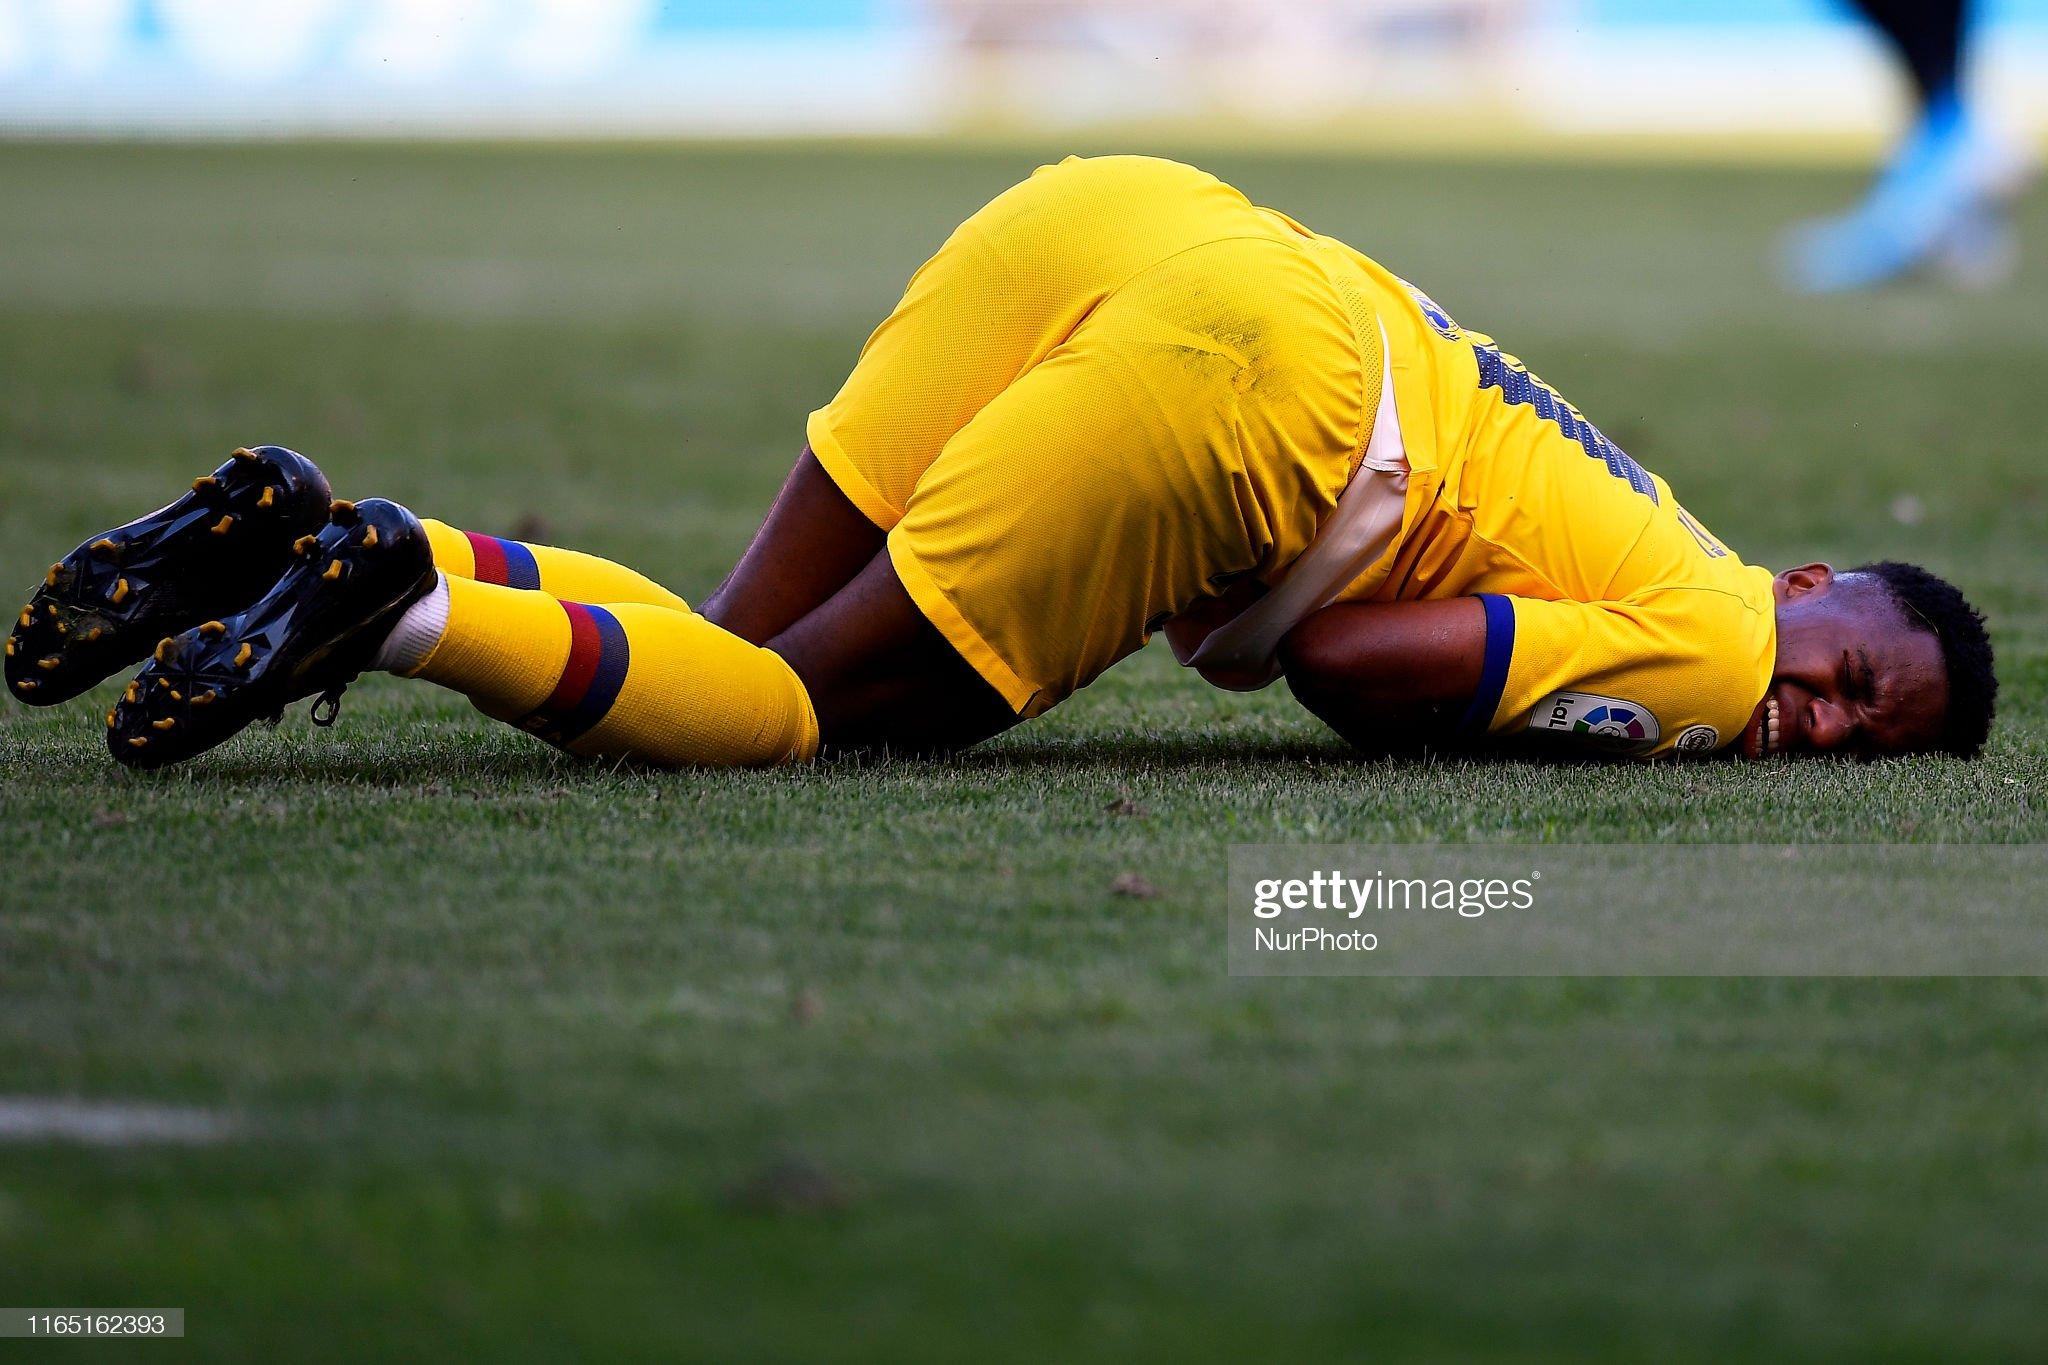 صور مباراة : أوساسونا - برشلونة 2-2 ( 31-08-2019 )  Ansu-fati-of-barcelona-lies-injured-on-the-pitch-during-the-liga-ca-picture-id1165162393?s=2048x2048